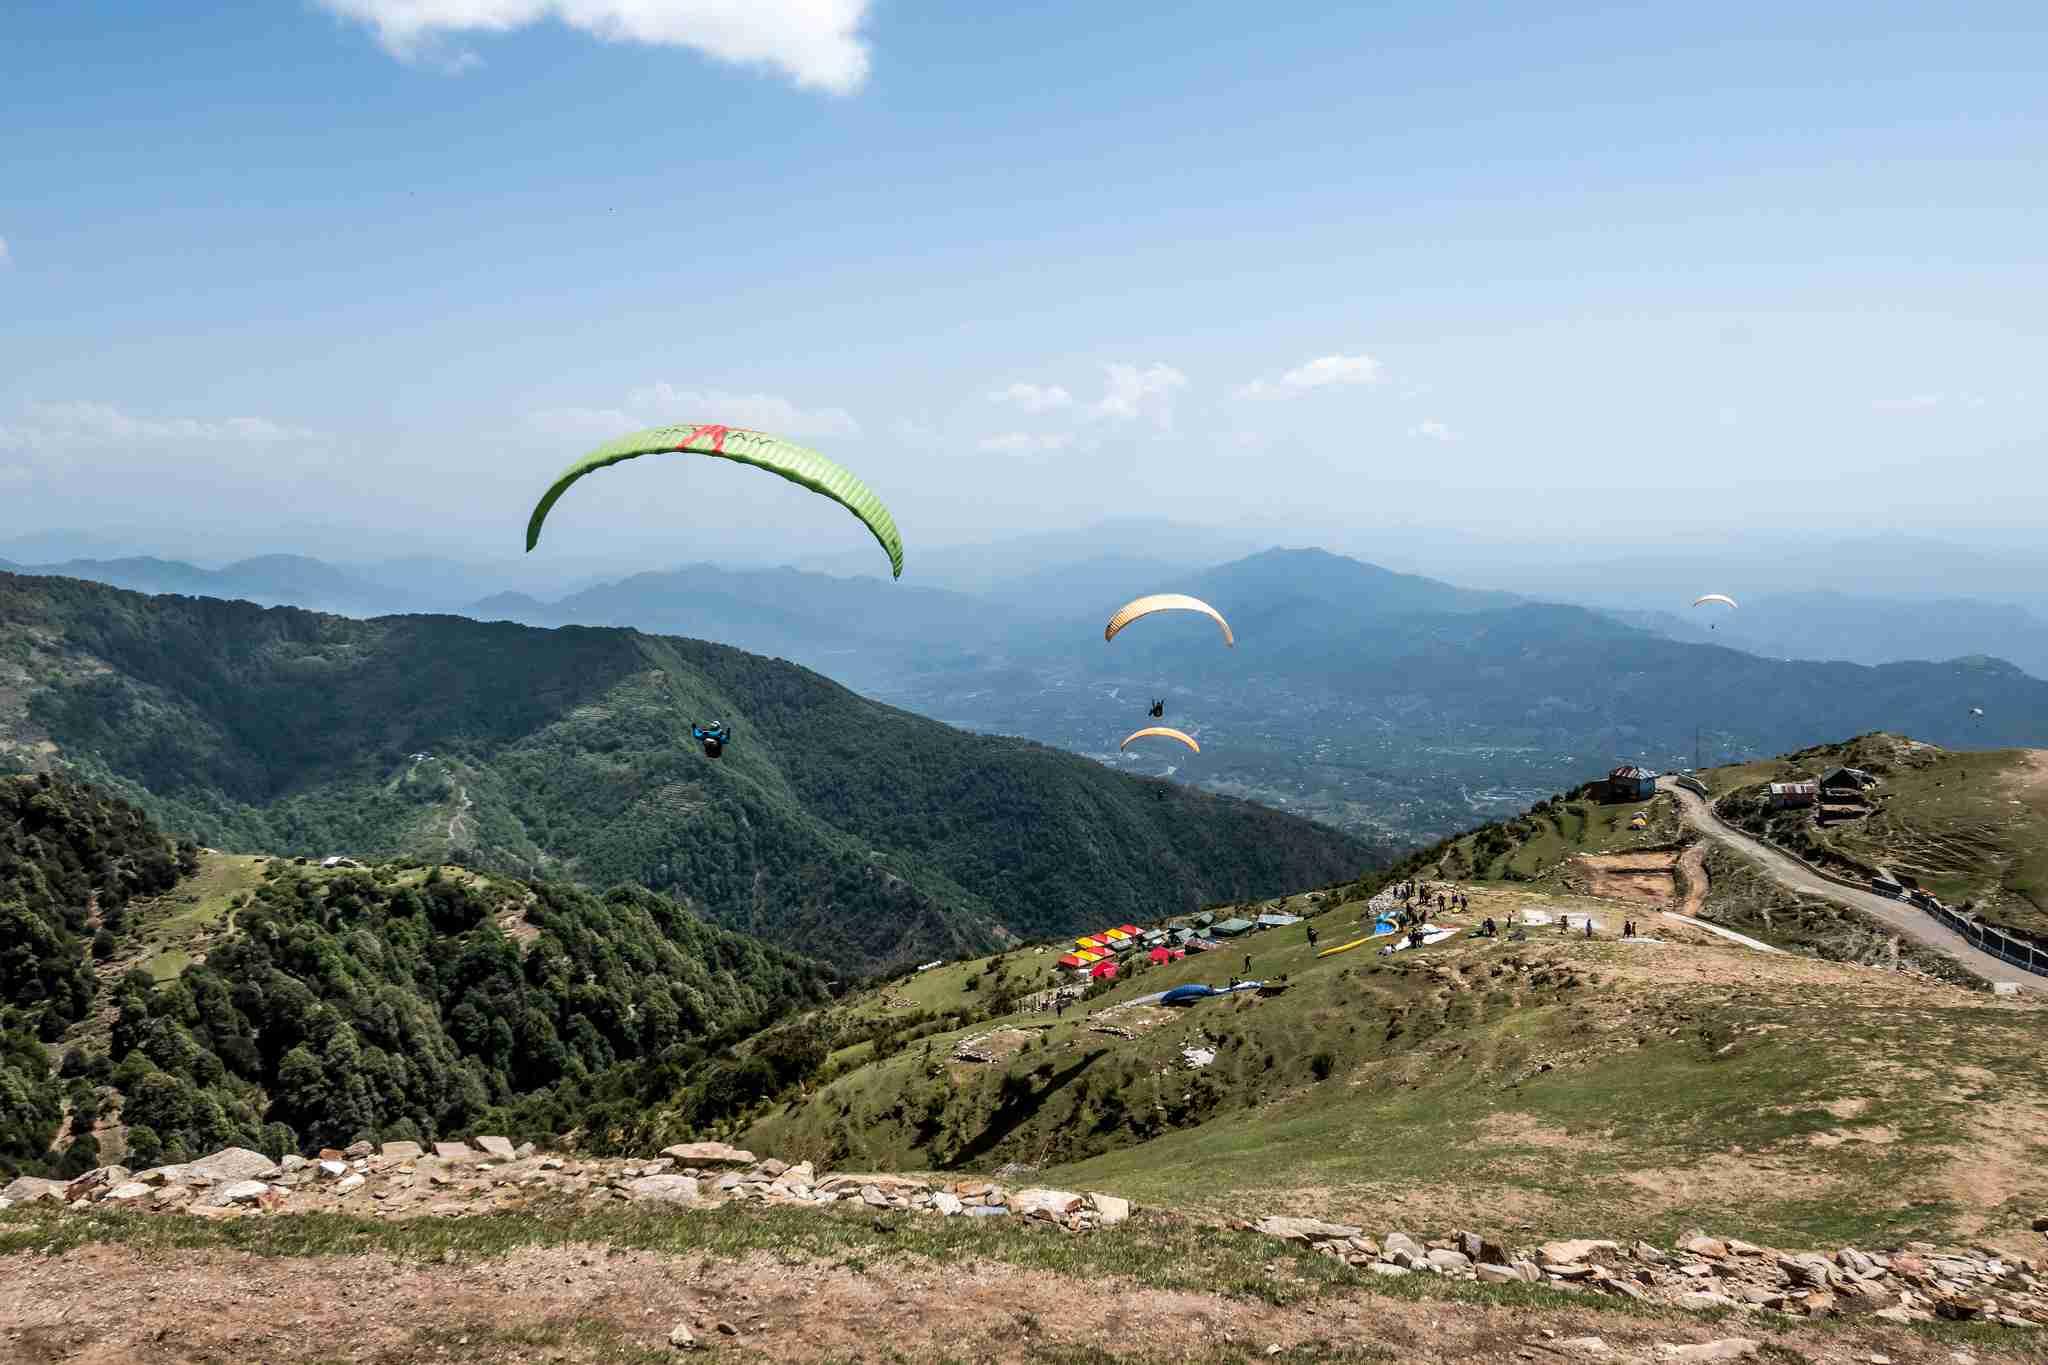 Bir Paragliding & Hiking 2017